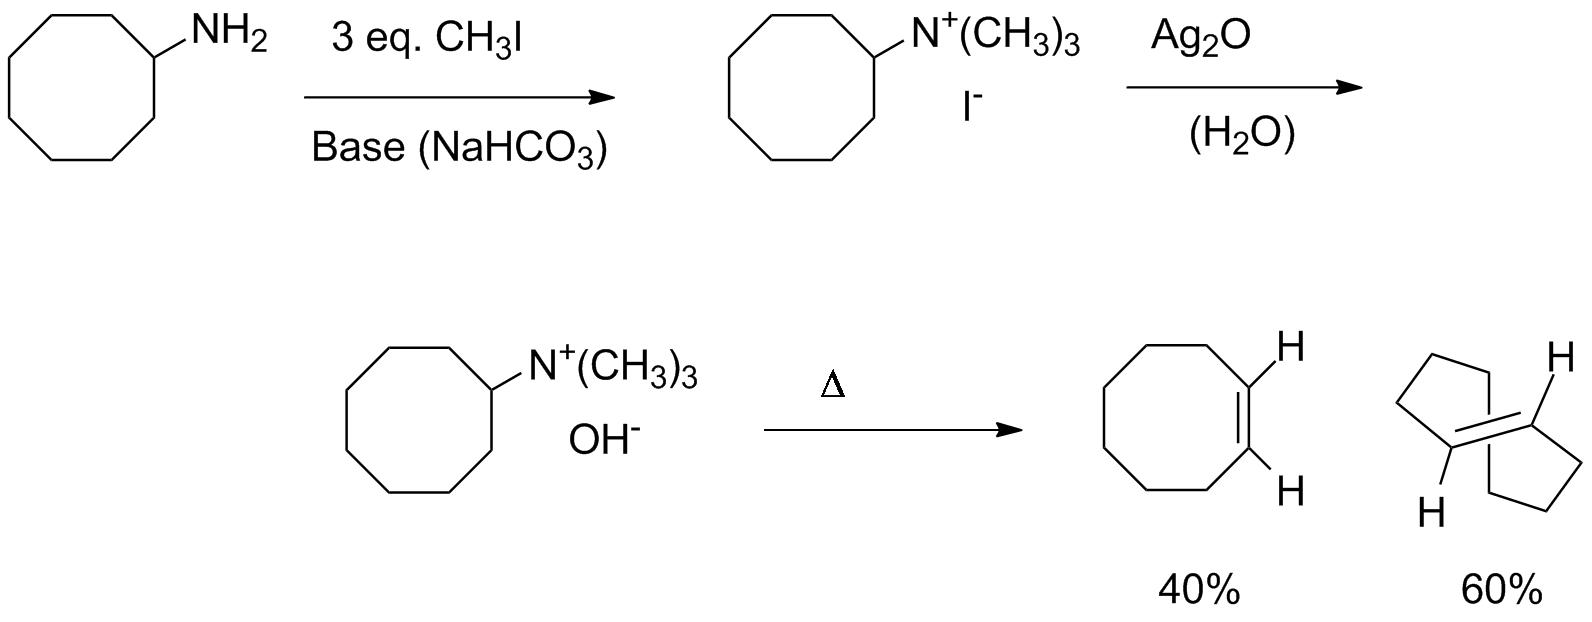 The Hofmann Elimination